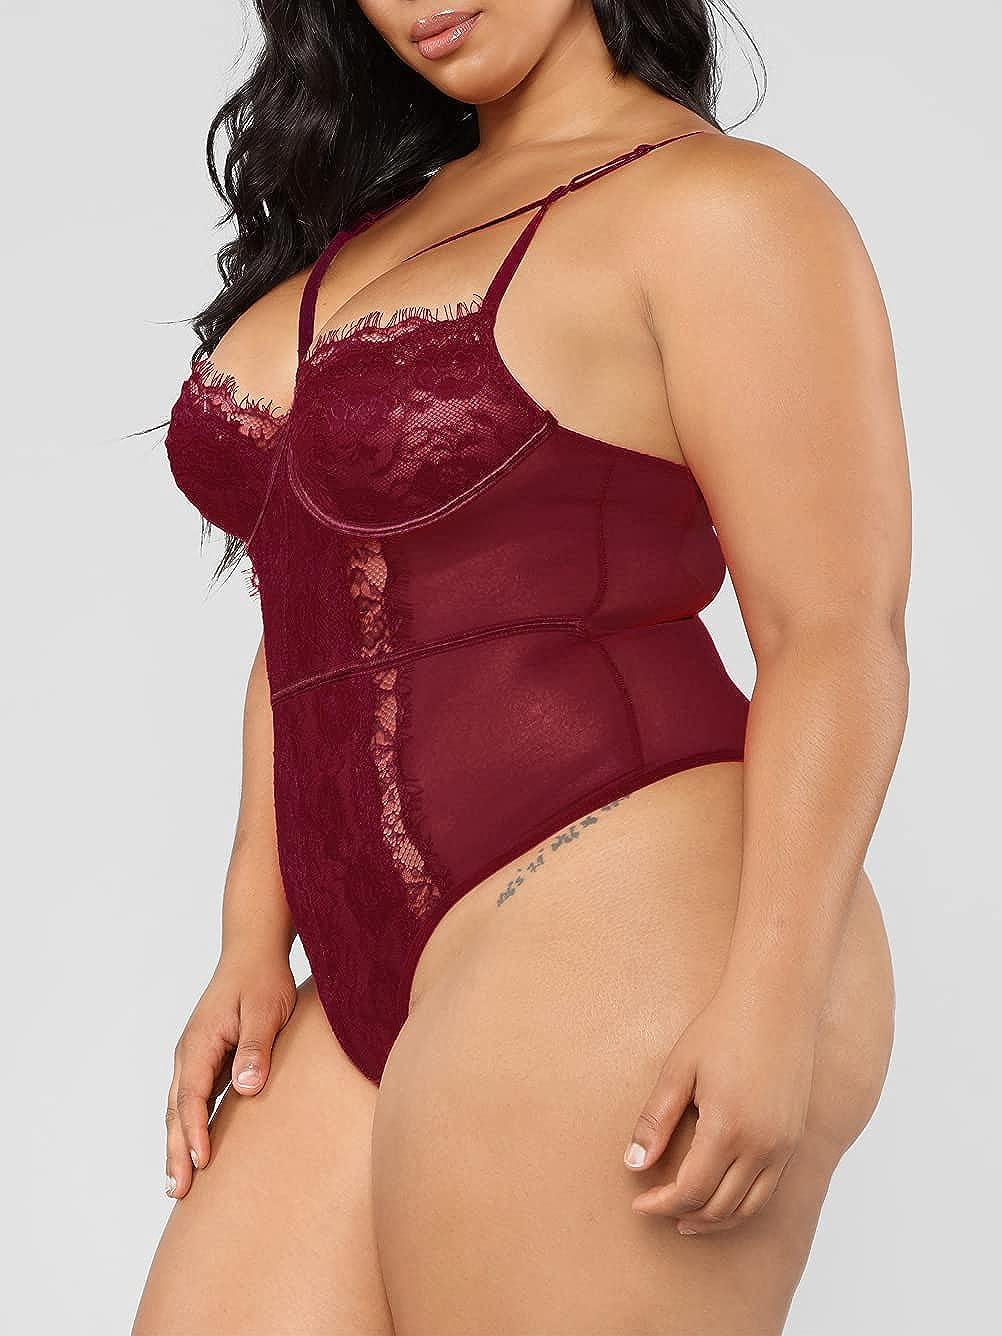 Kaei&Shi Plus Size Lingerie for Women,Sheer Lace Sexy V Neck Bodysuit,Eyelash One Piece Floral Teddy Valentine